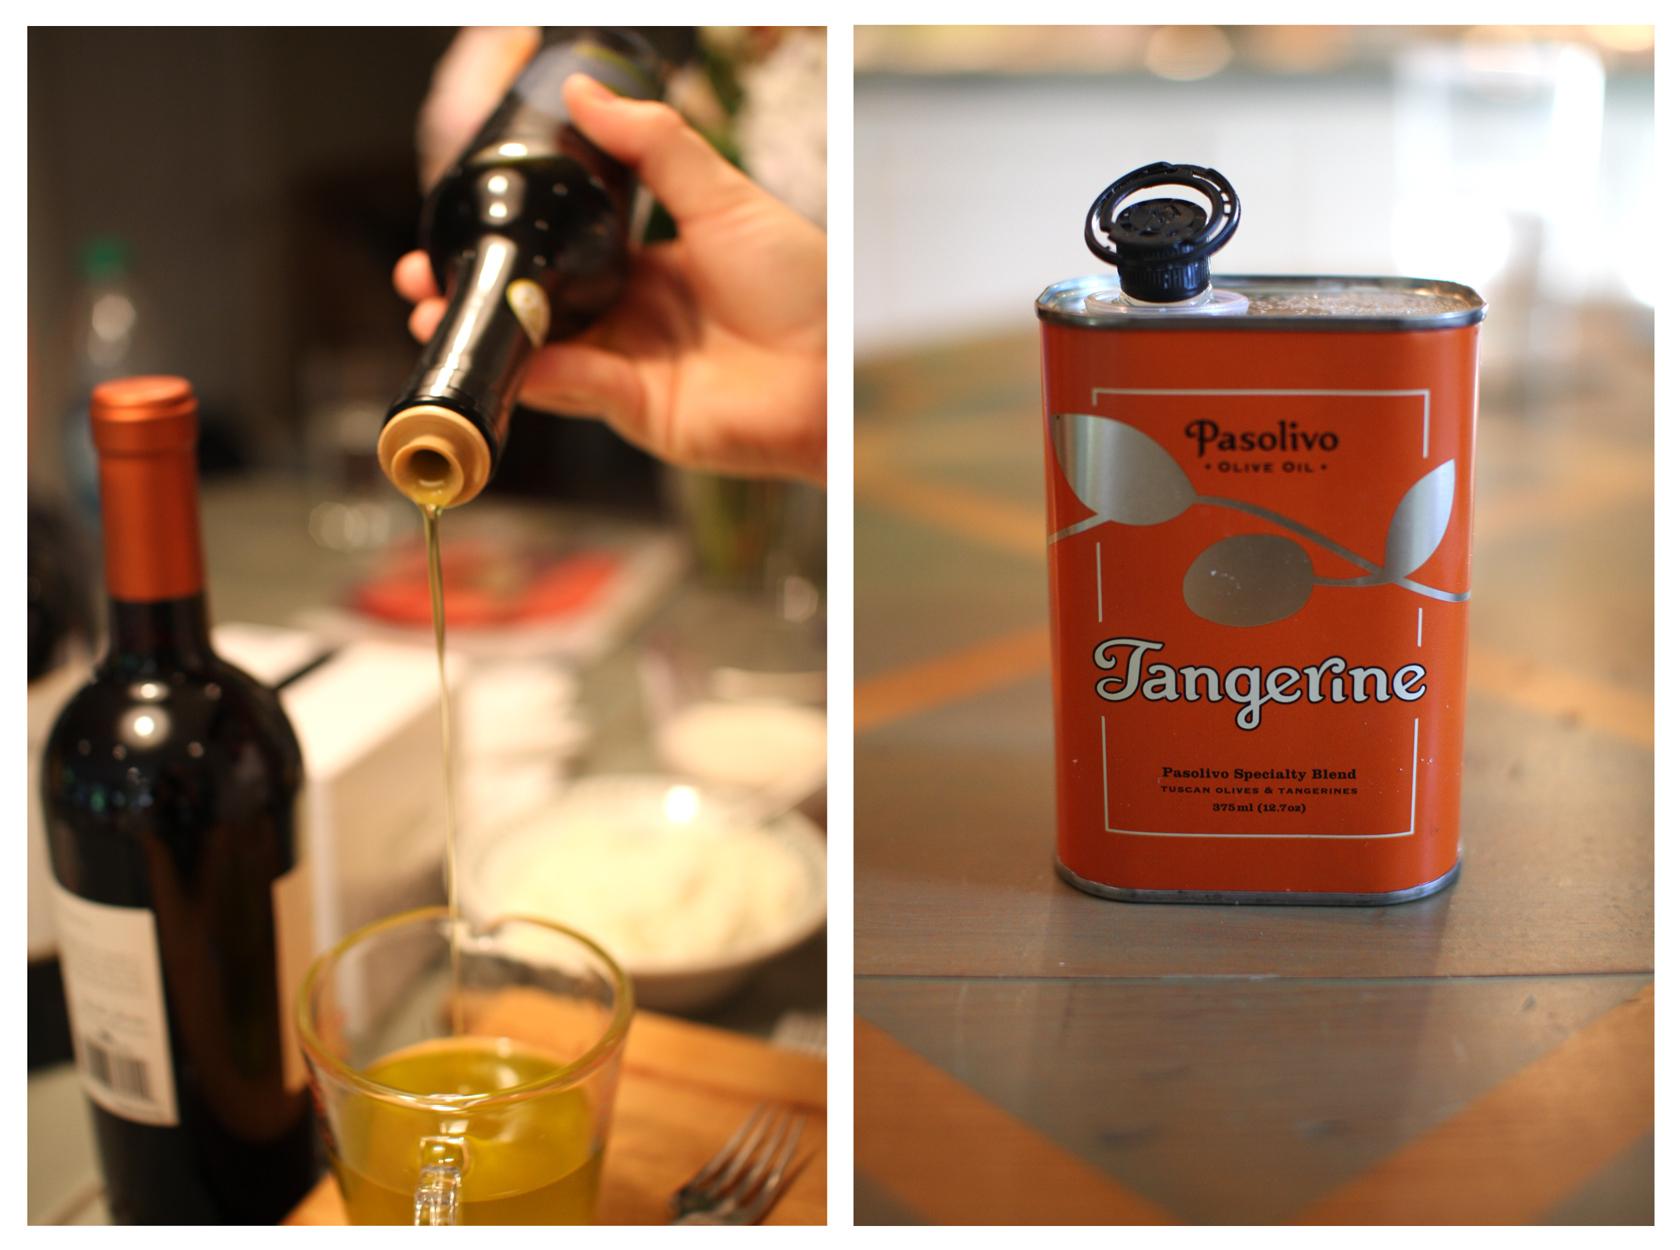 olive_oil_tangerine_olive_oil.jpg